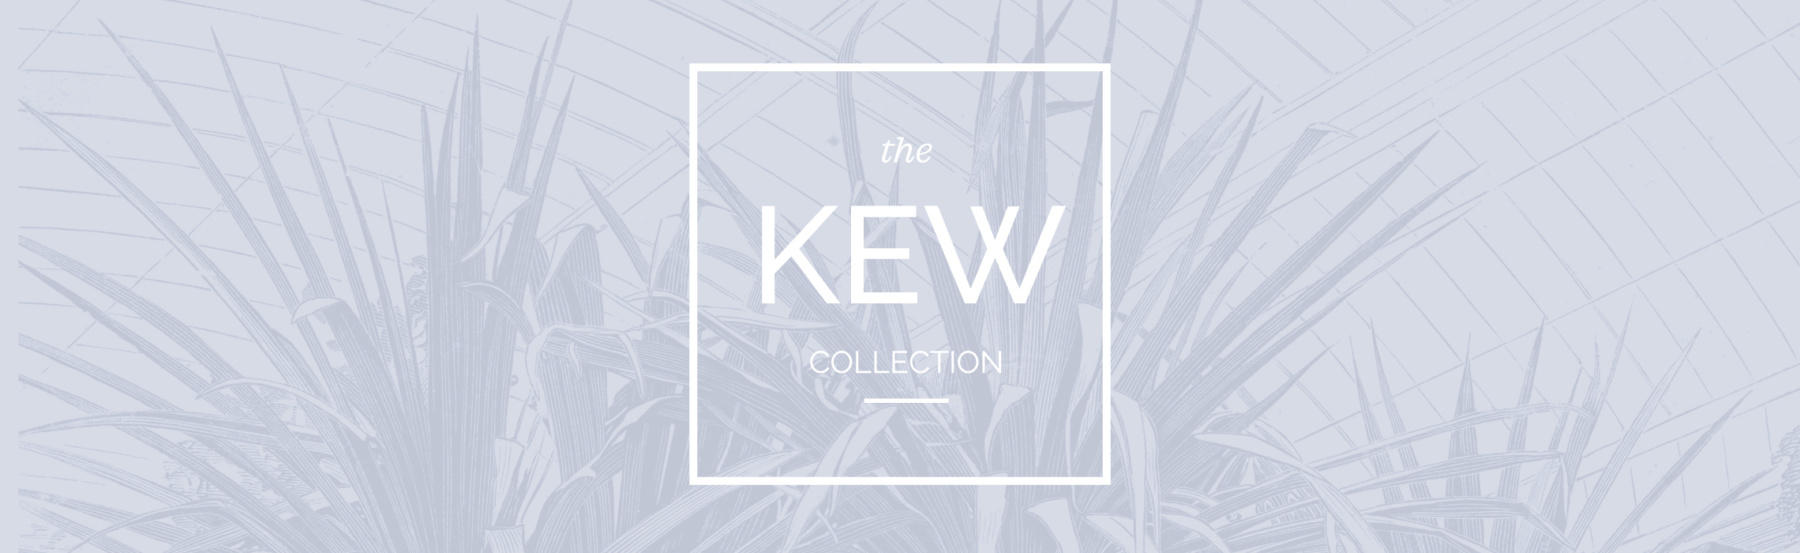 The Kew Collection exclusive to Malvern Garden Buildings